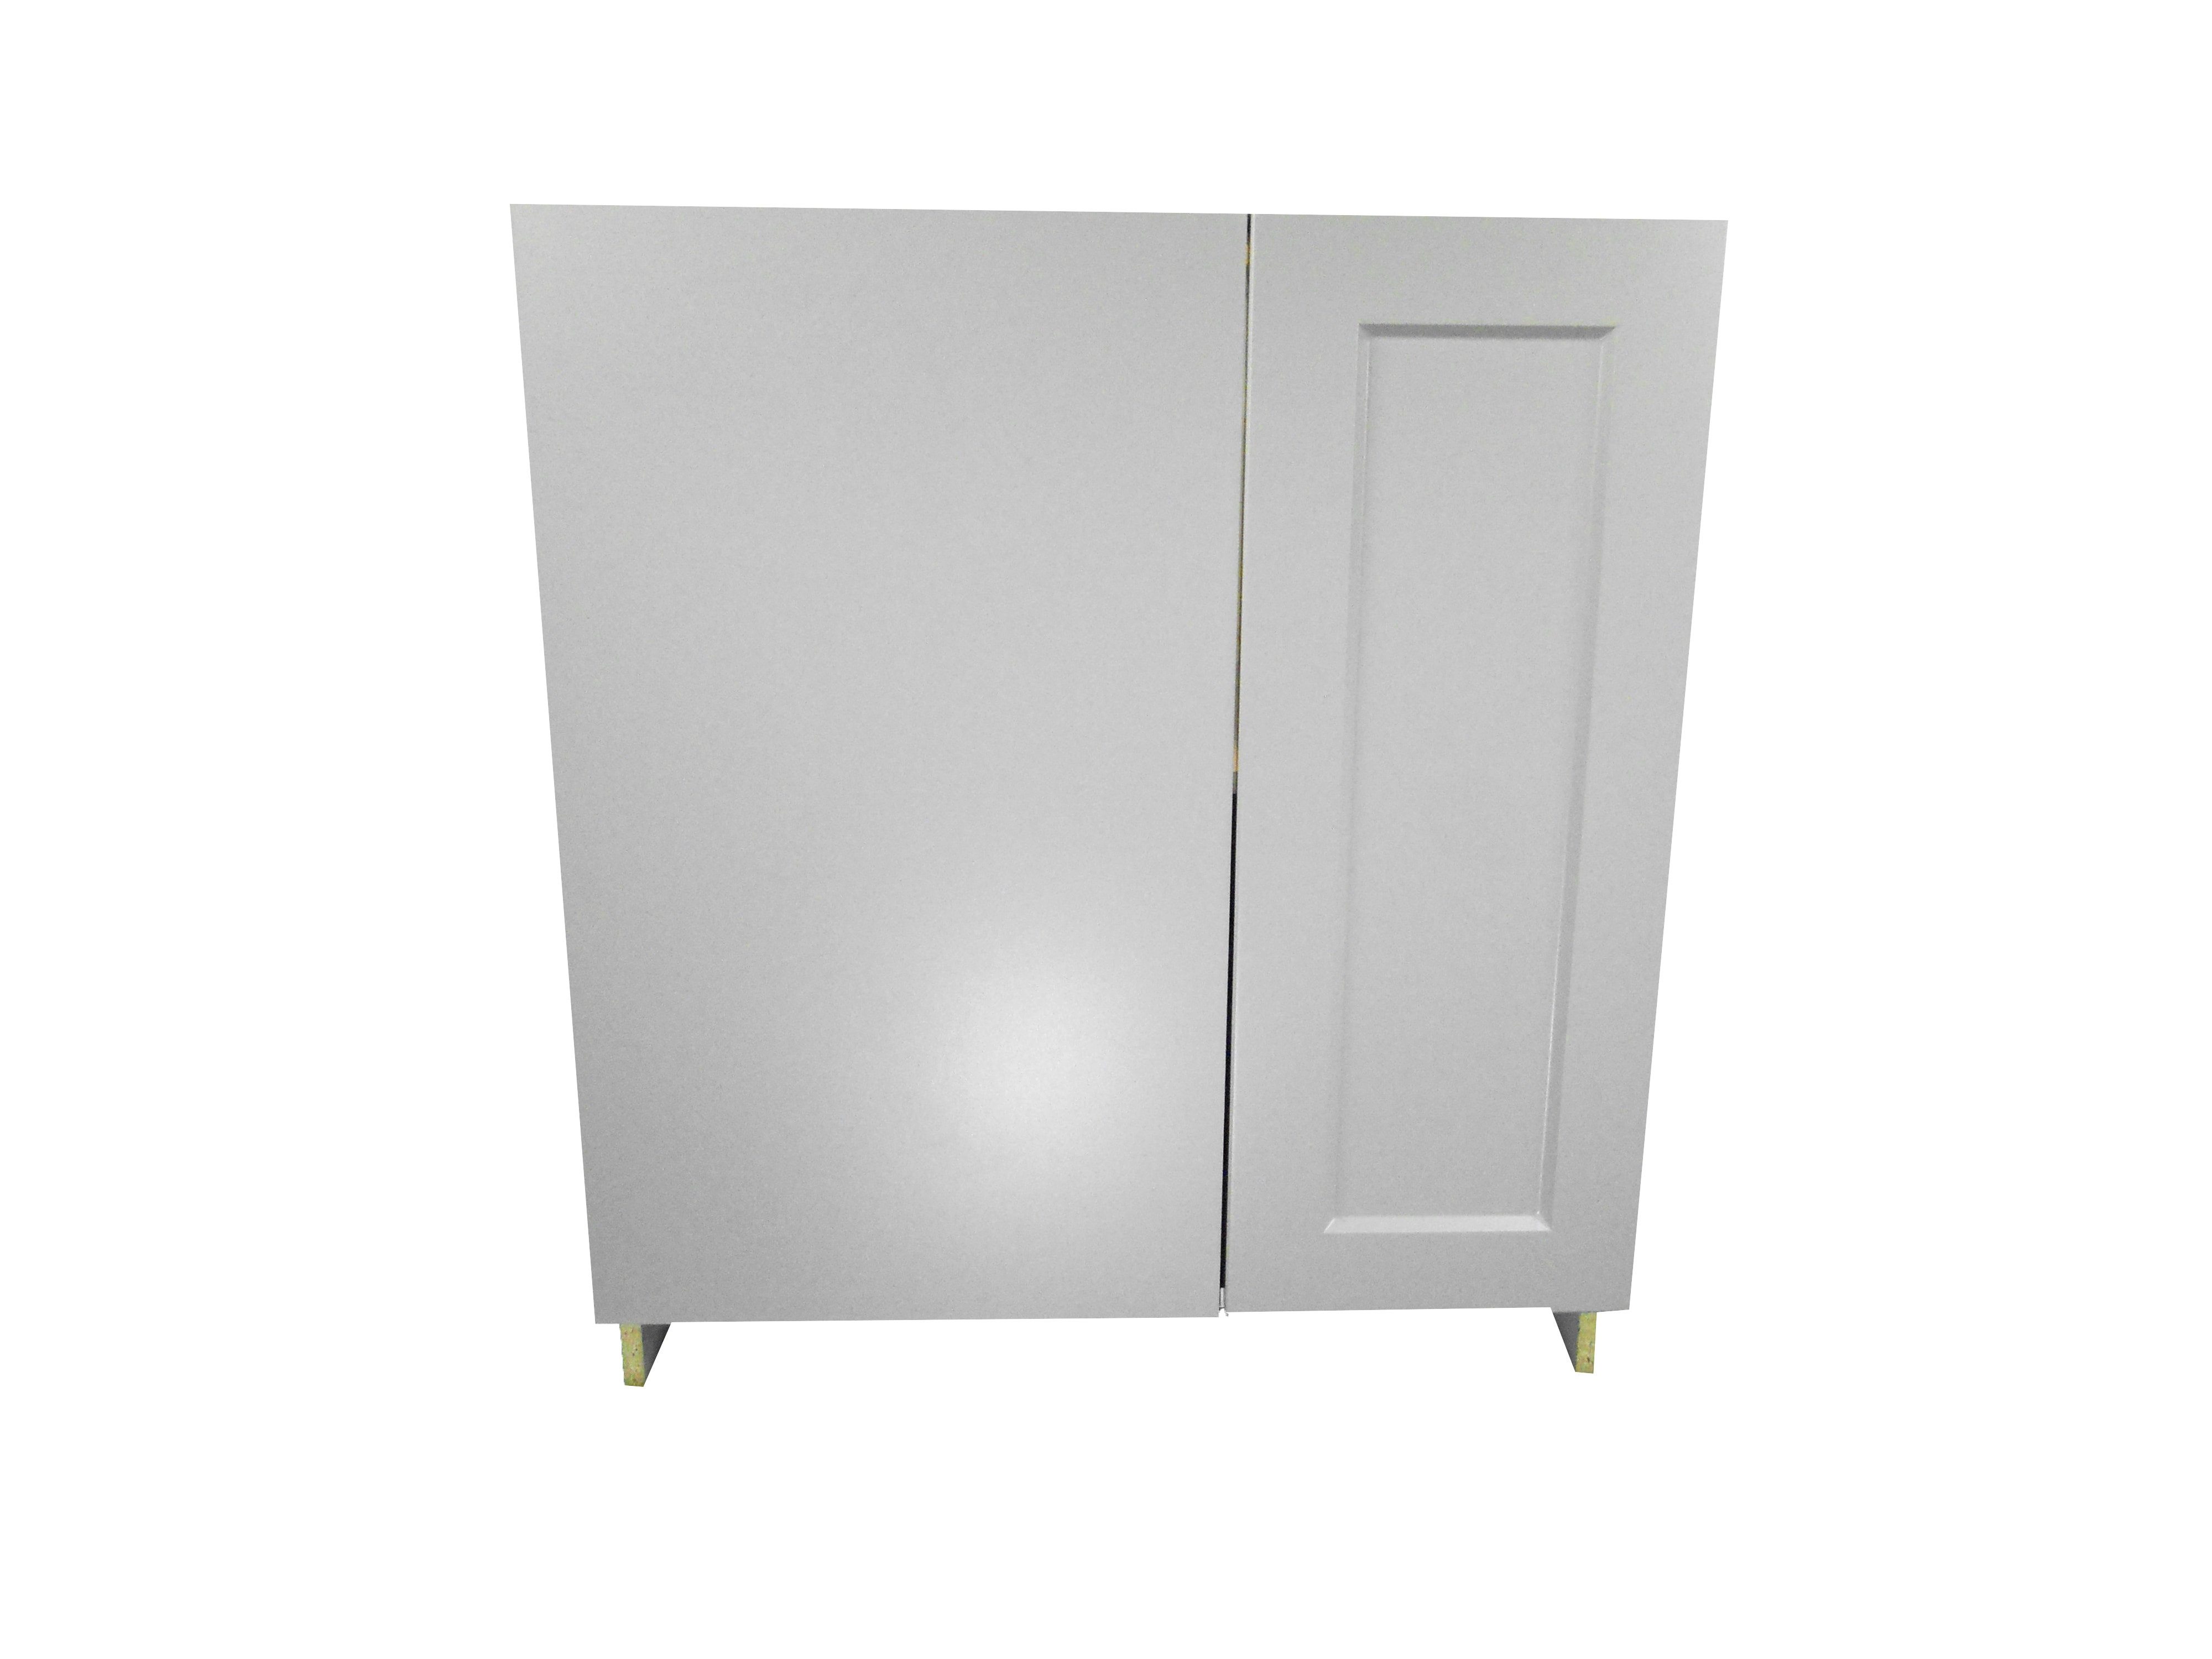 Blind Base Cabinet with Door / Whistler Grey / Flat Panel Grey / 30 Whistler Grey 0